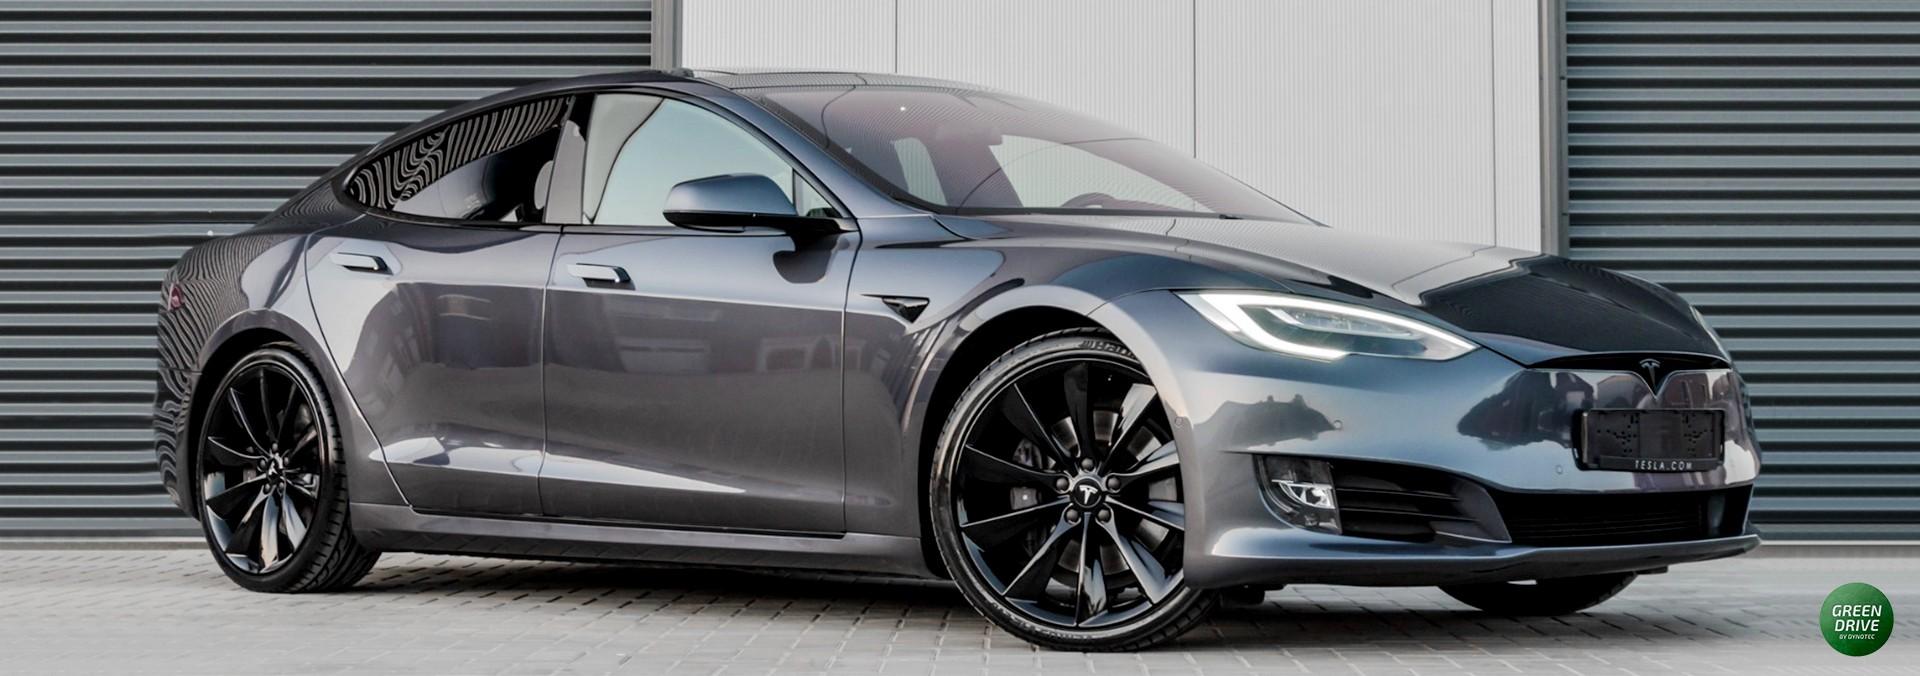 Model S chrome delete